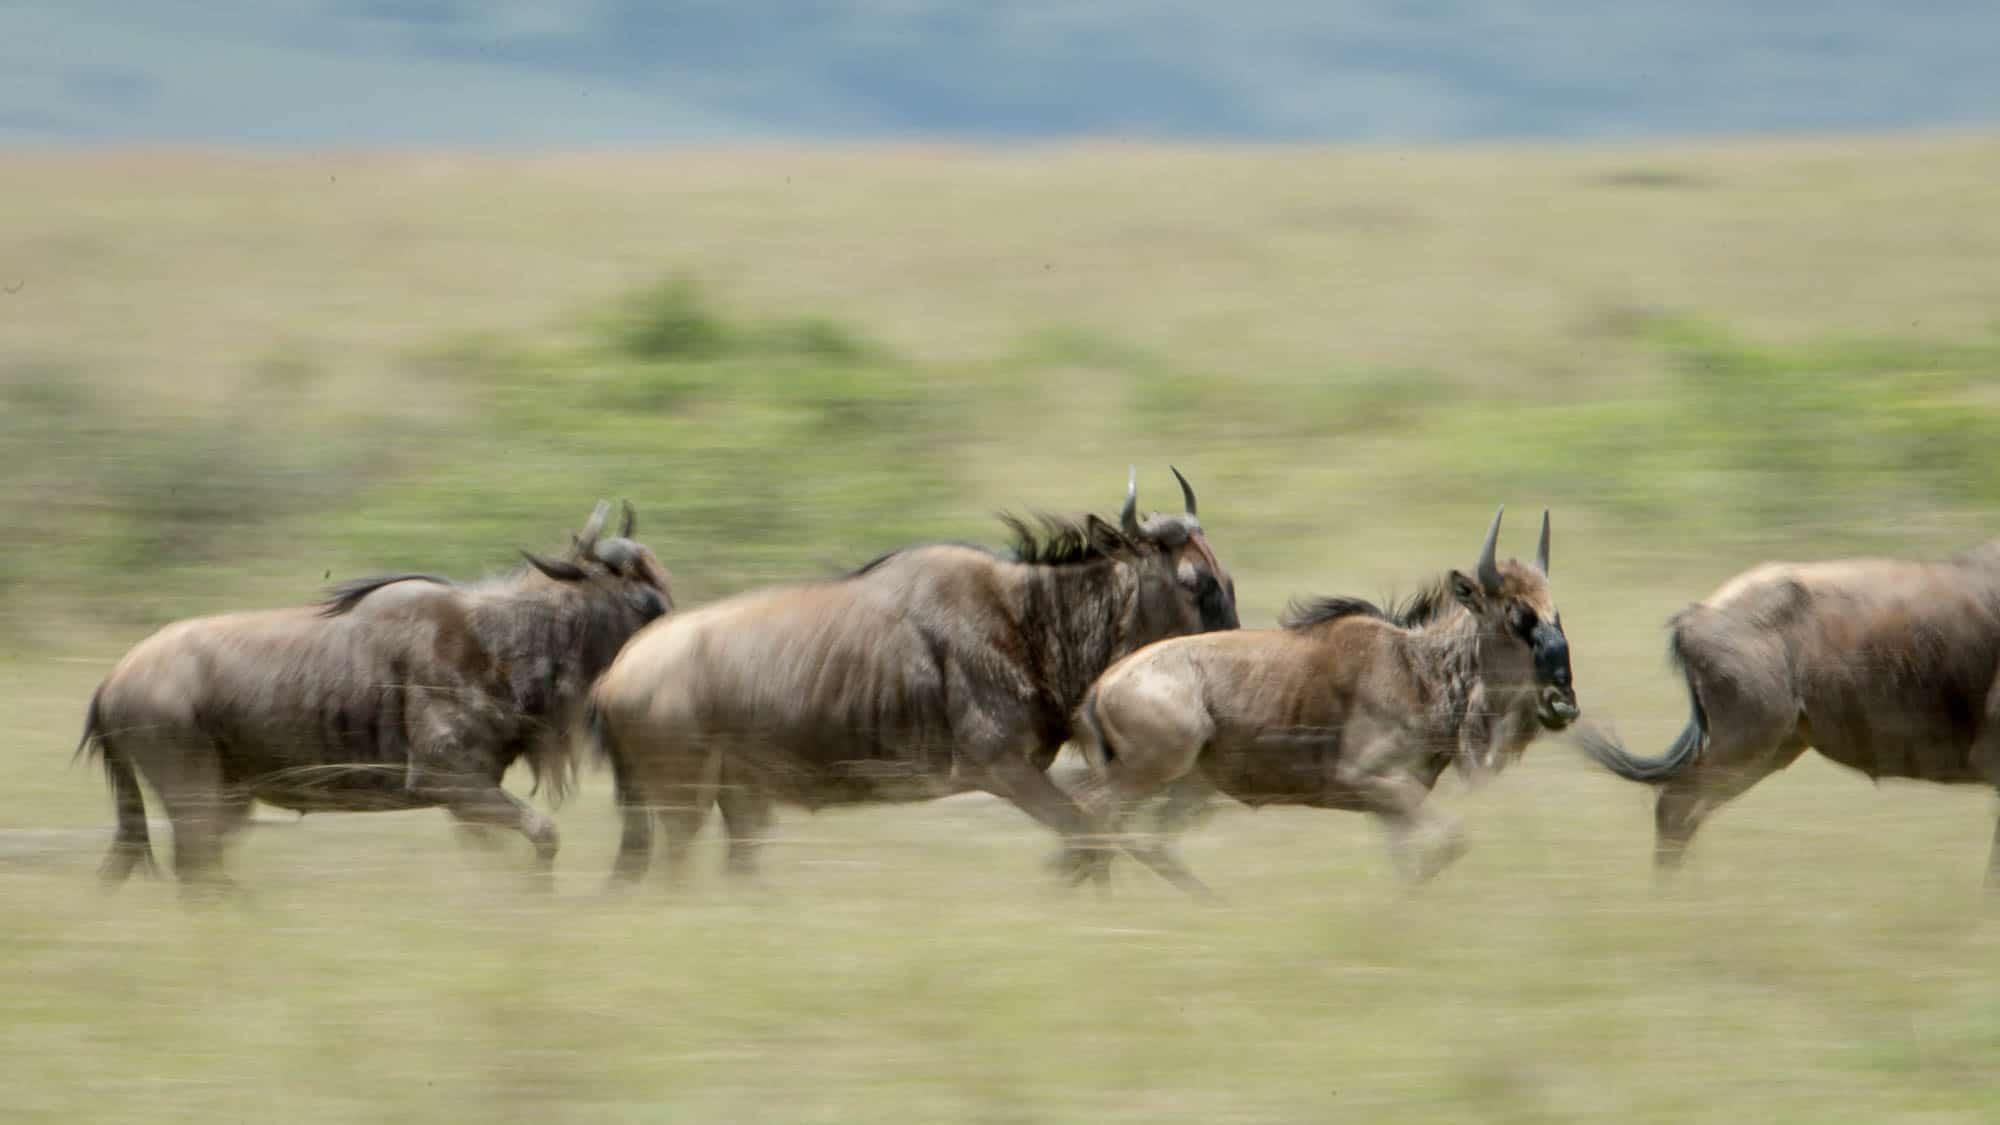 Wildebeest running in the Mara Triangle, Kenya